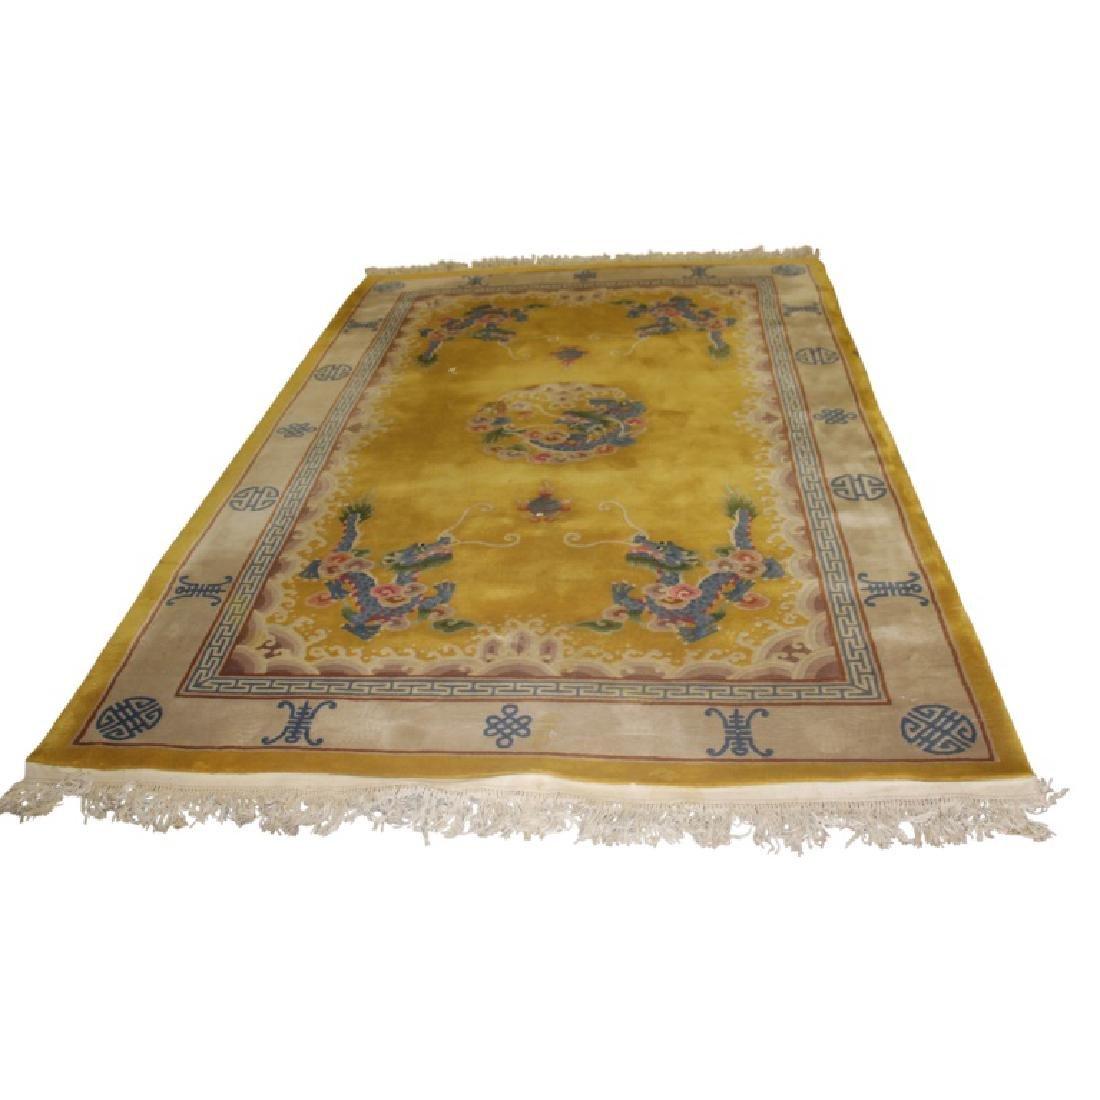 Handmade Asian Carpet 302-4 - 7